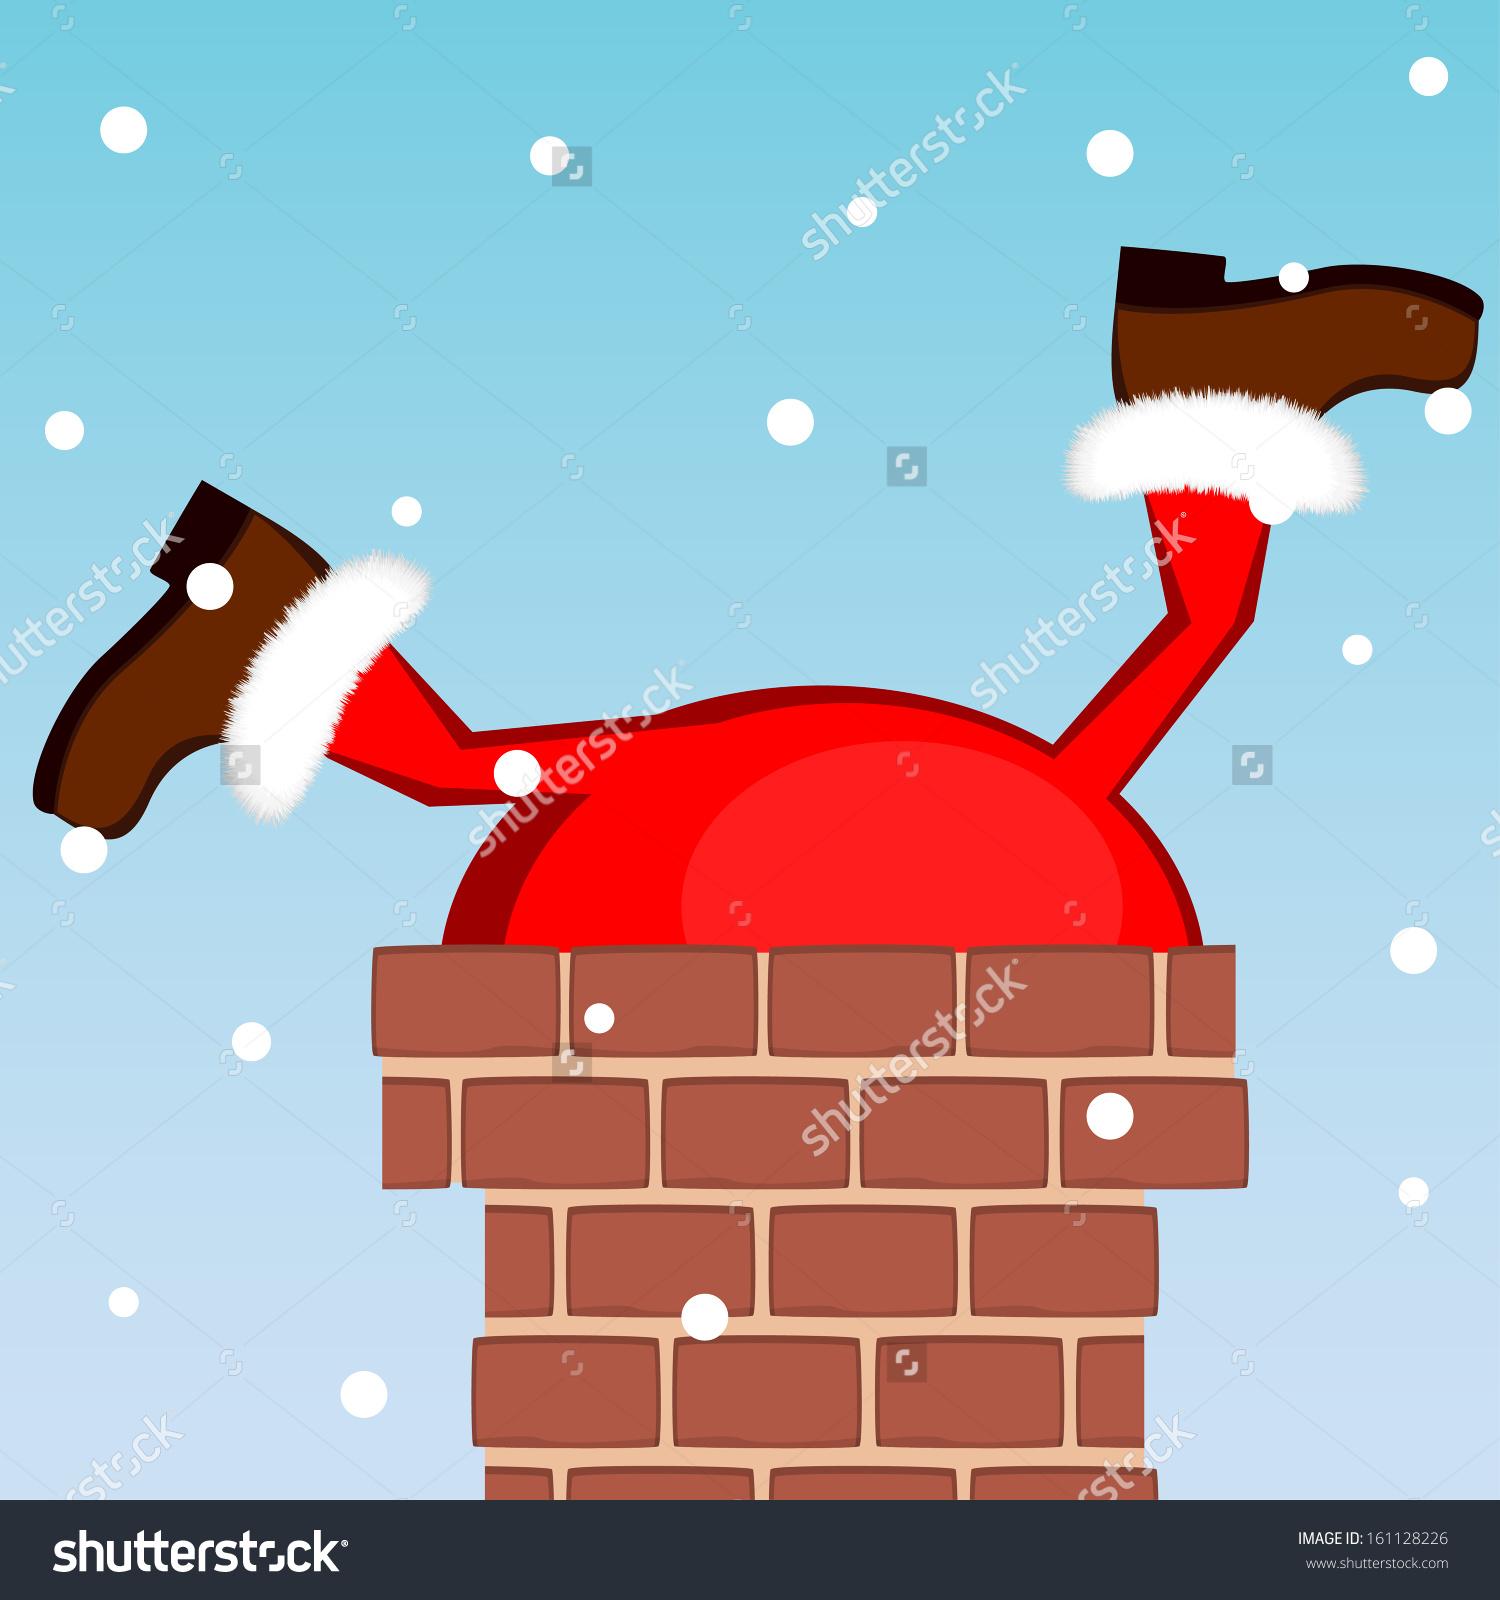 santa stuck in a chimney clipart #6